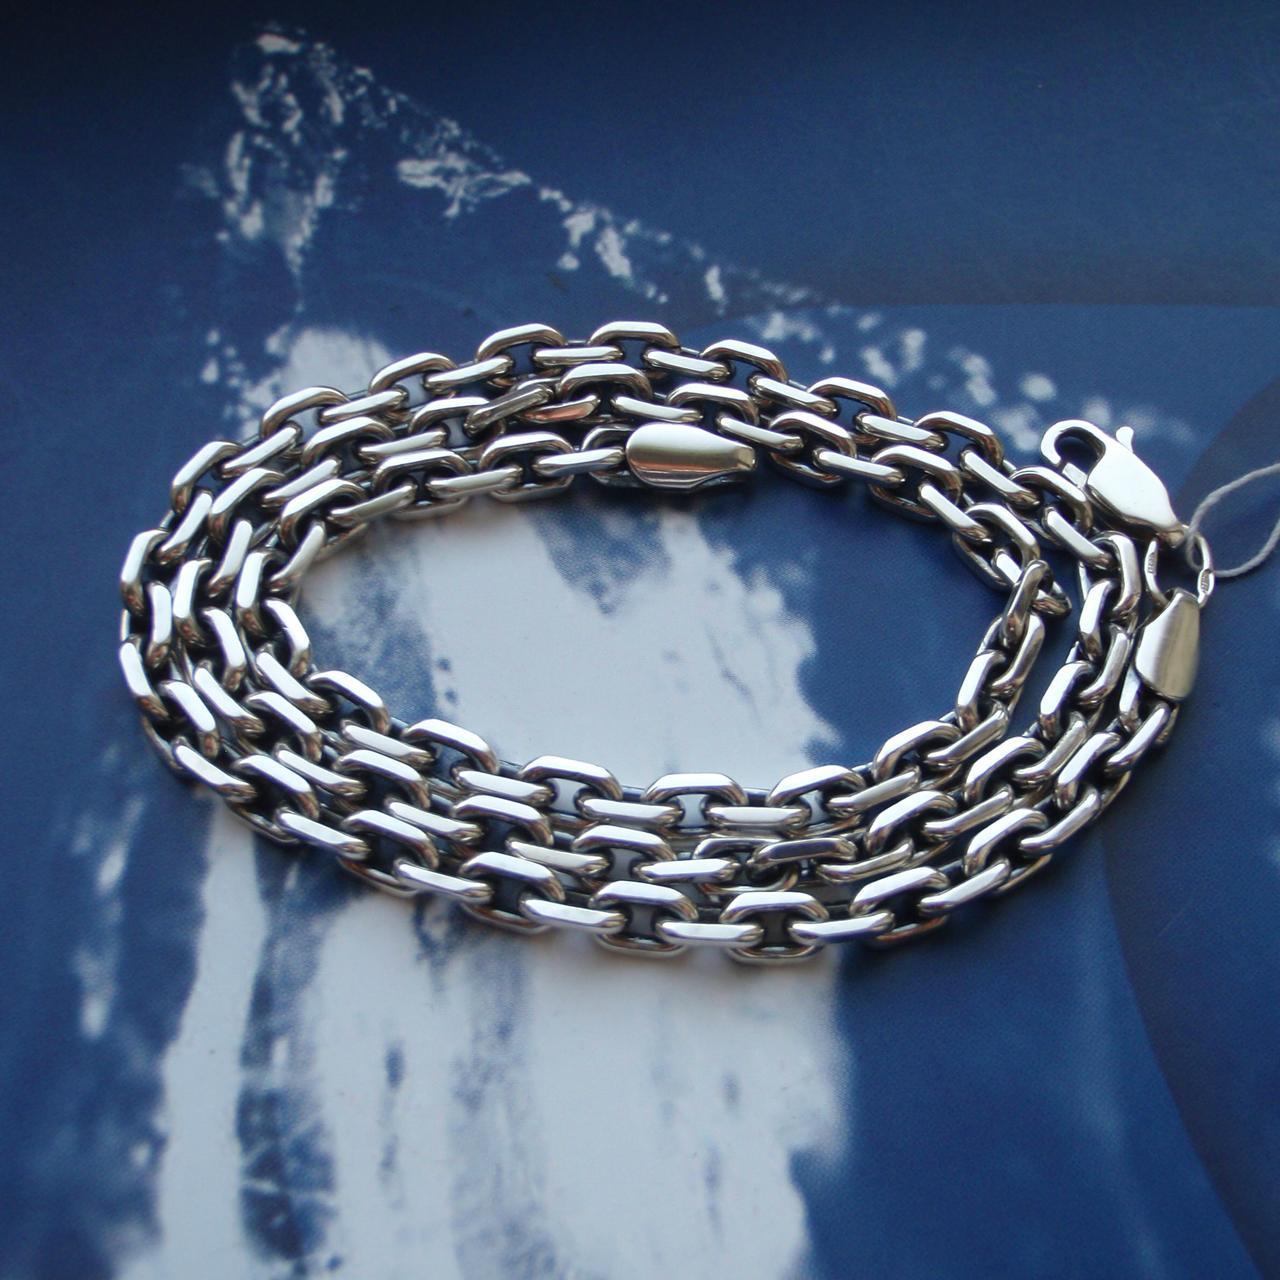 Серебряная цепочка, 700мм, 62 грамма, якорное плетение